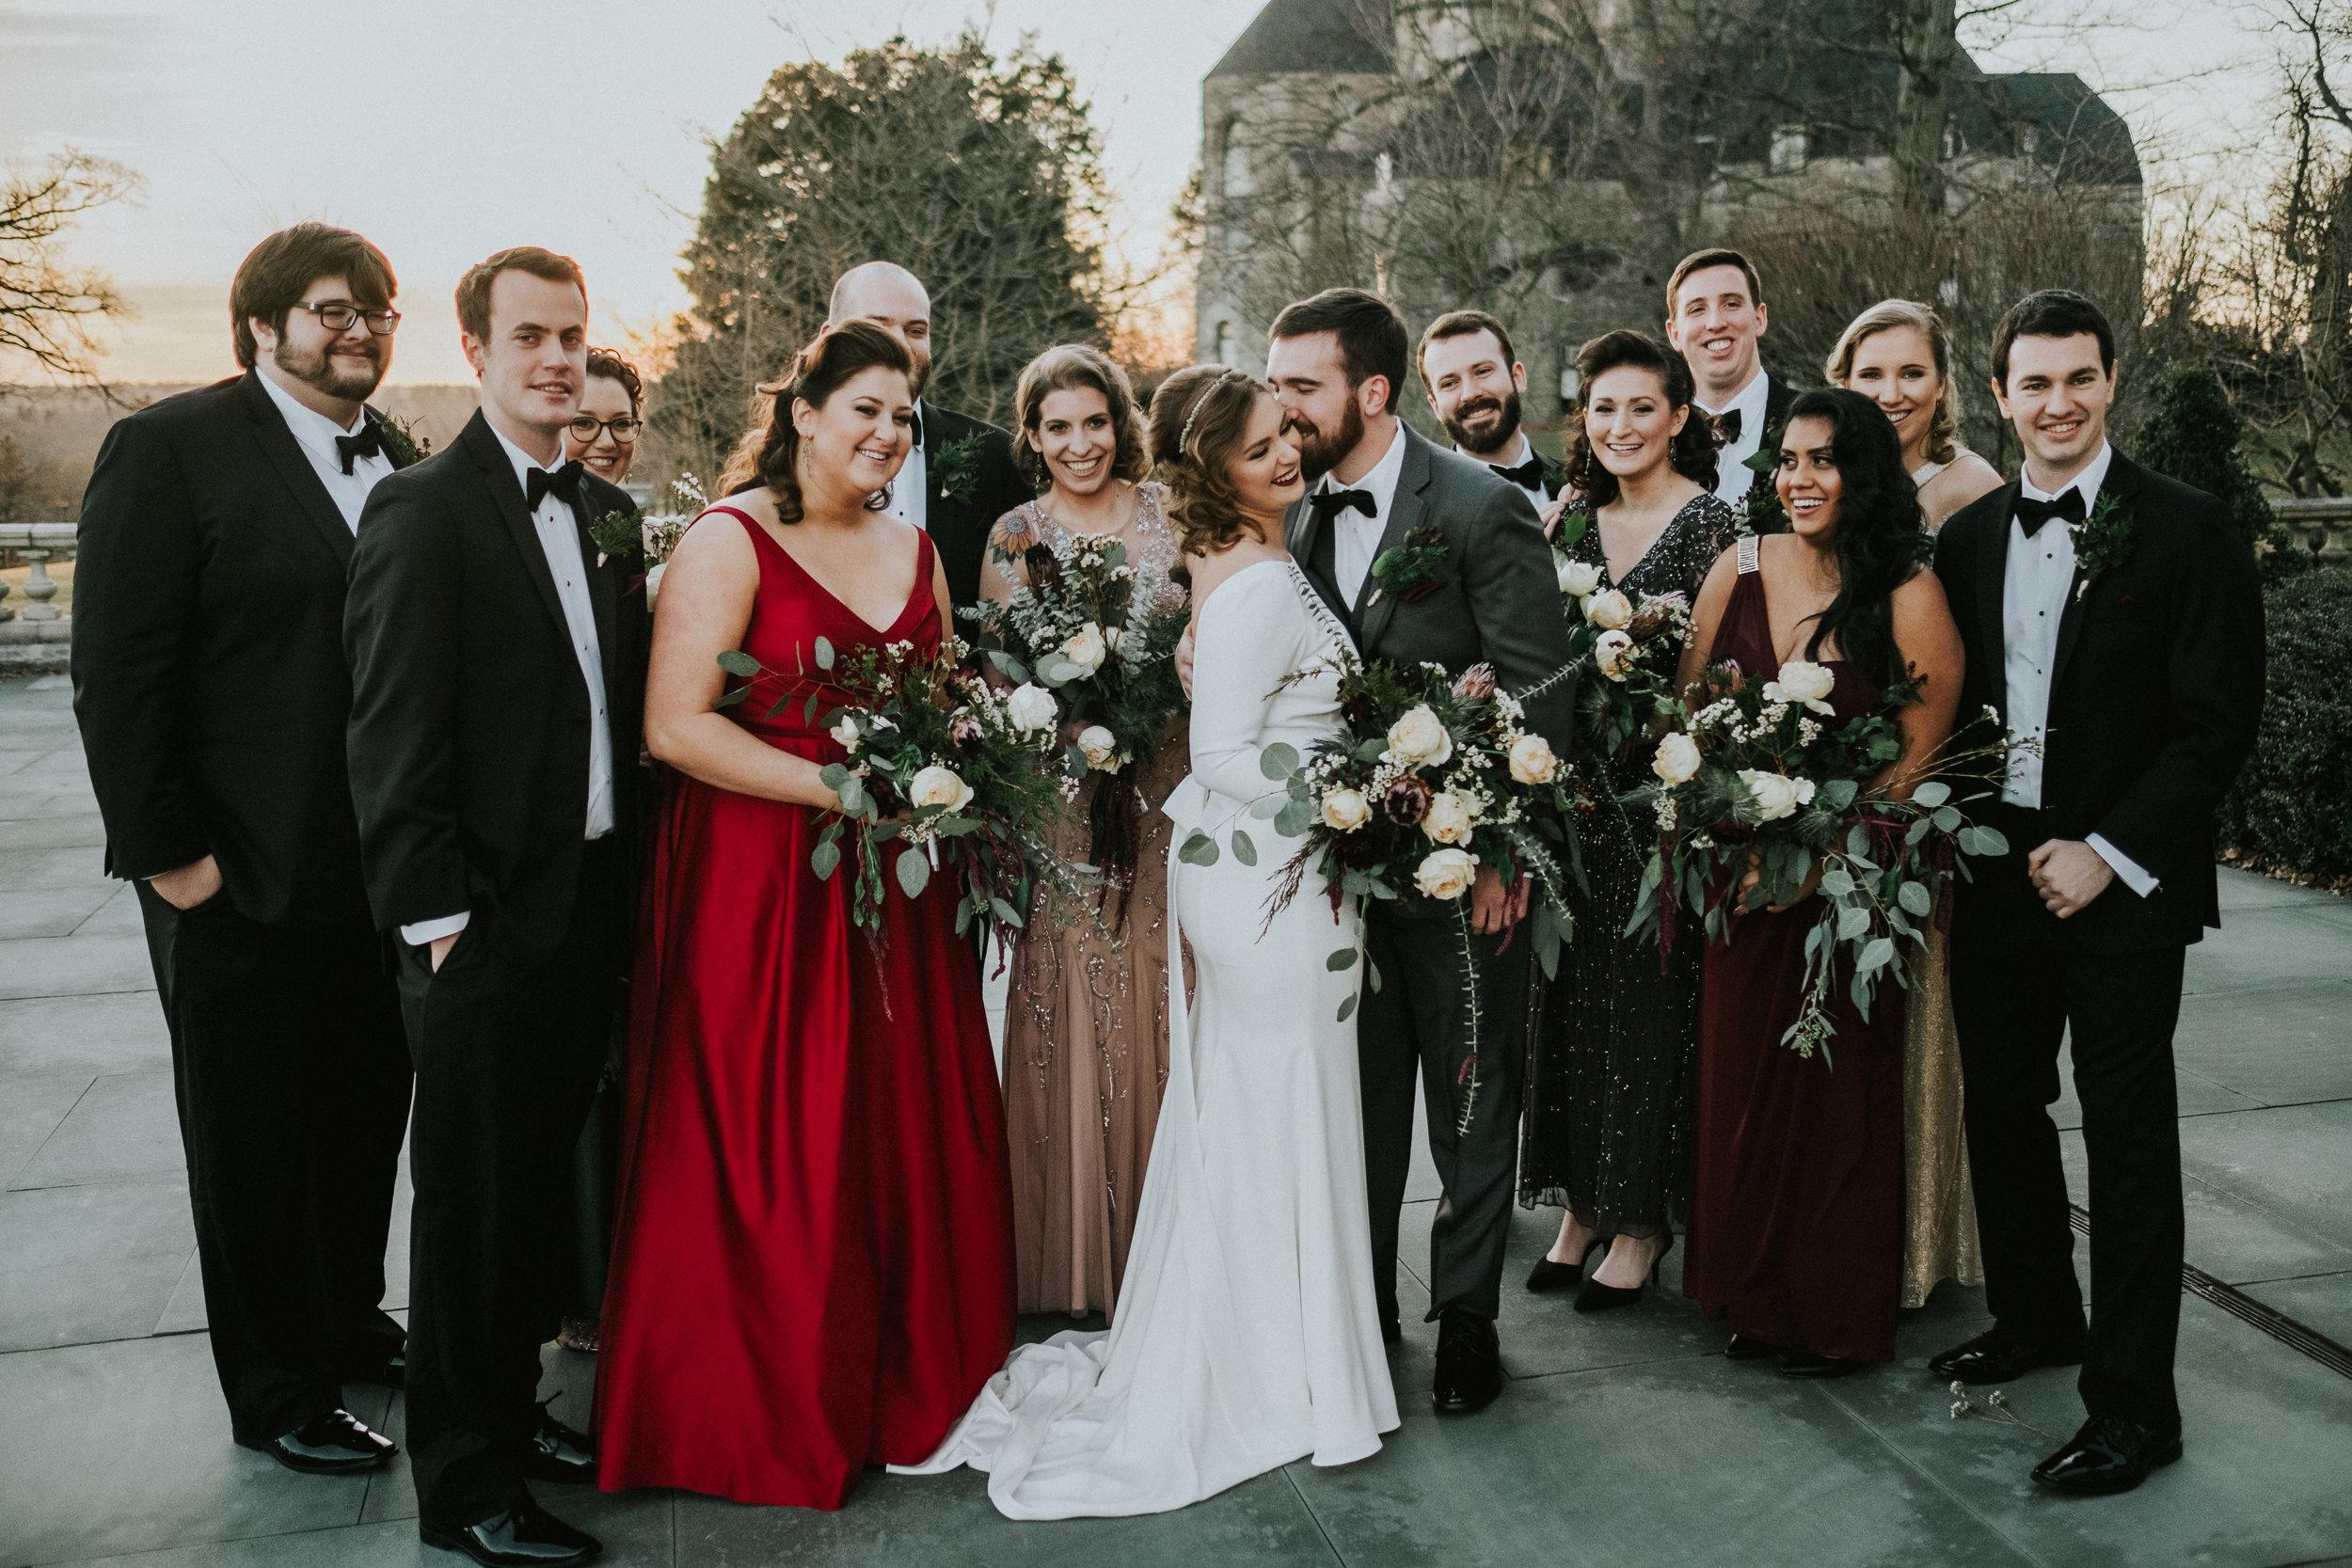 Cairnwood-Estate-Amelia-and-Patrick-Wedding-548.jpg